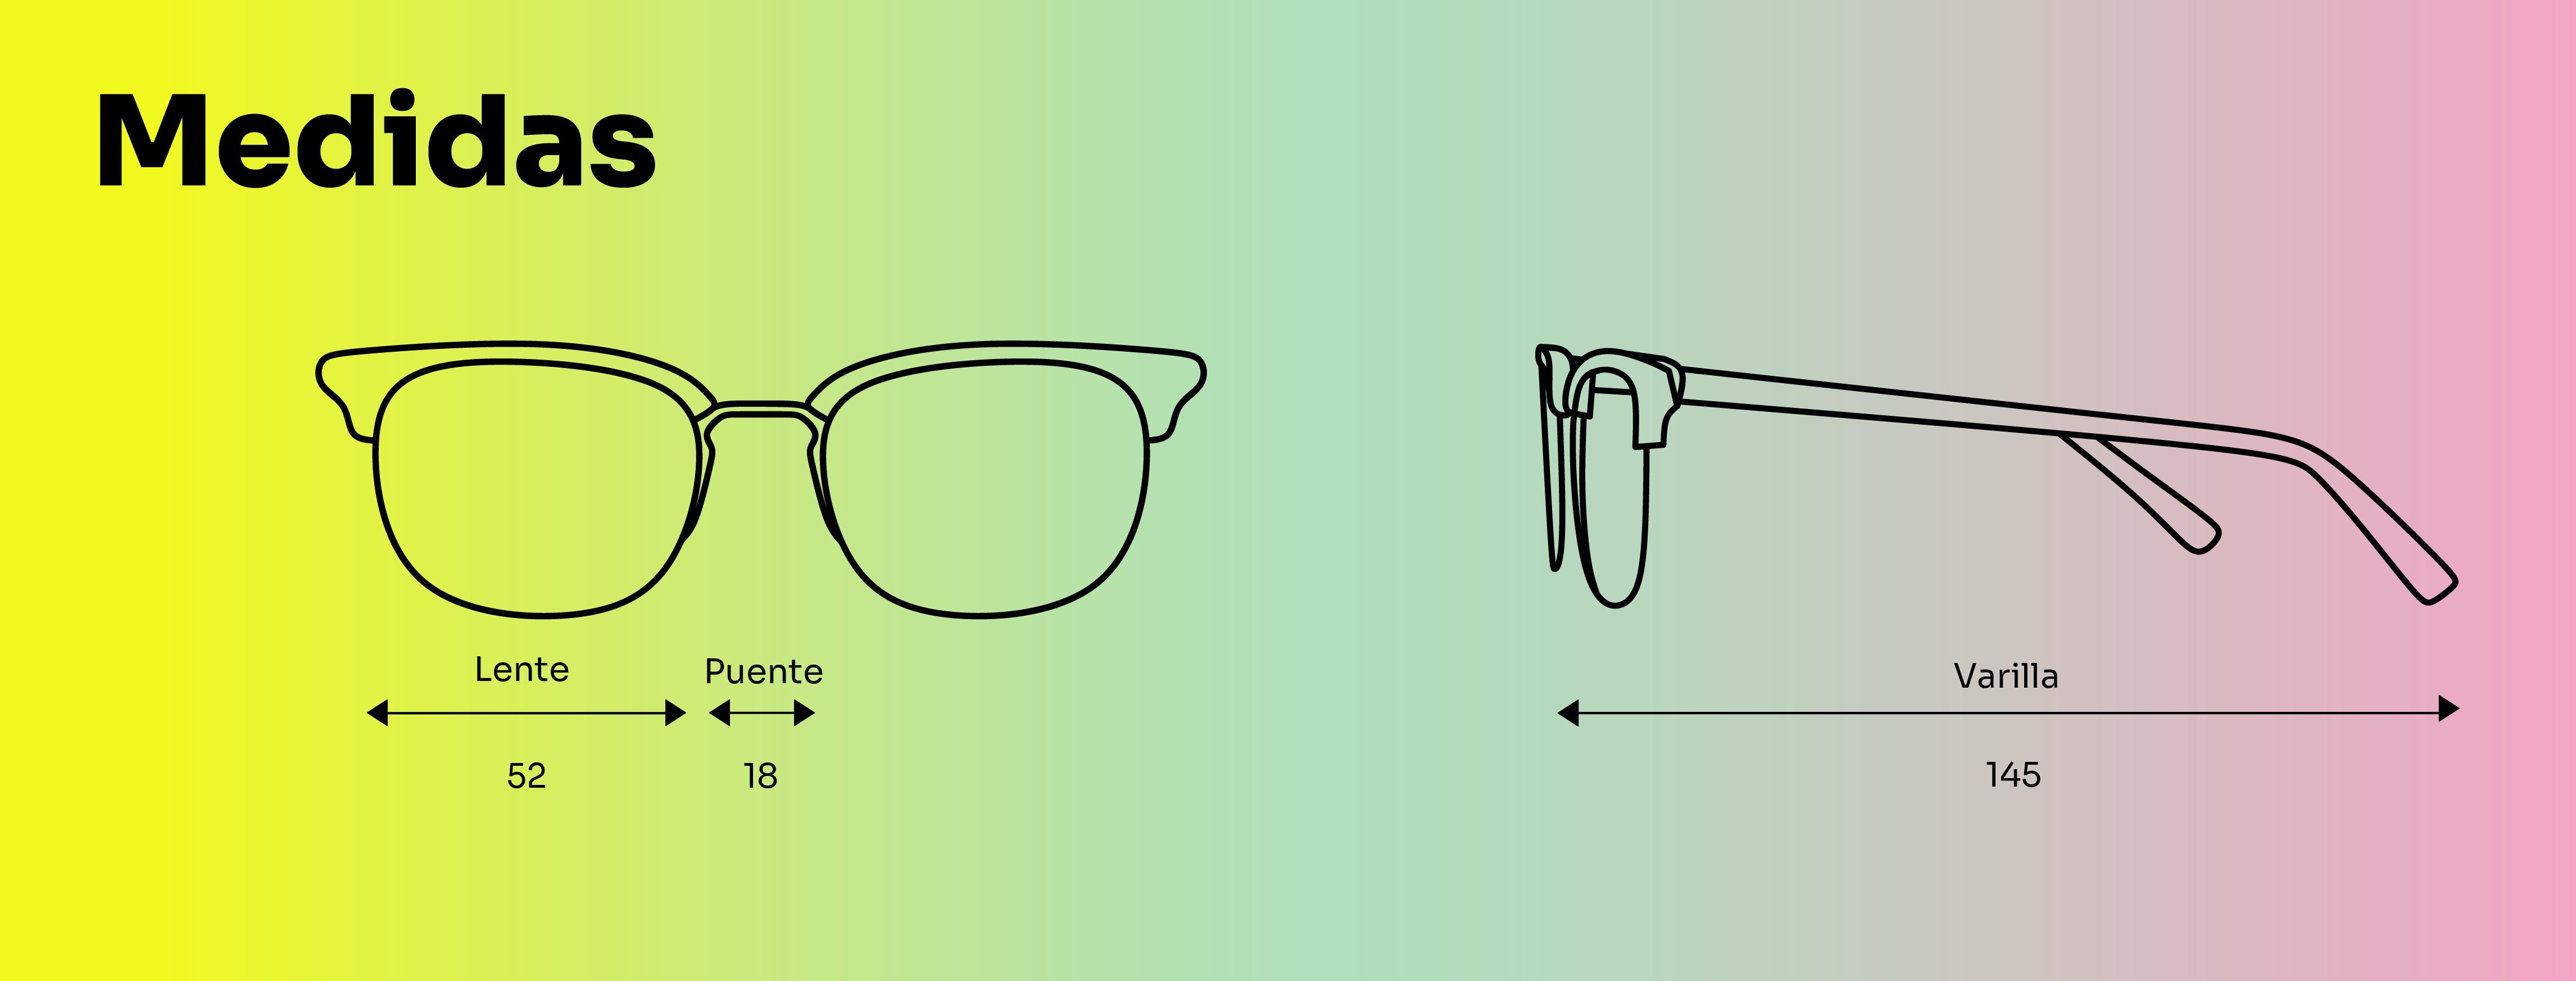 medidas-montura-de-gafas-graduadas-de-marca-Gioia